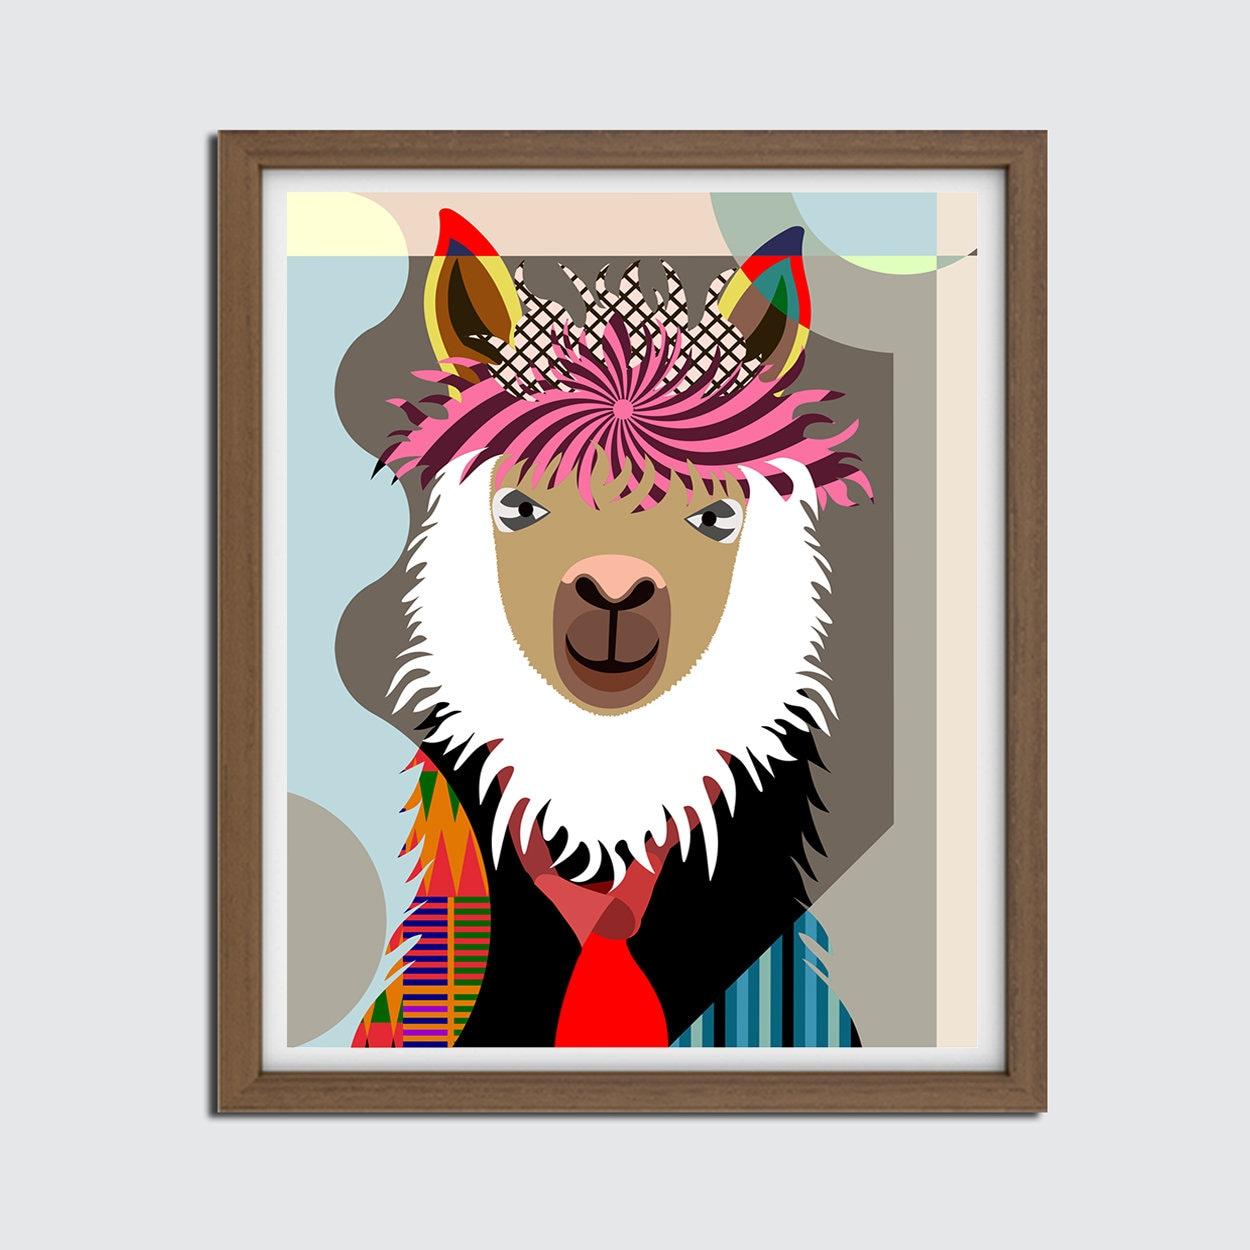 Llama Wall Art Decor Gift, Hipster Animal Painting